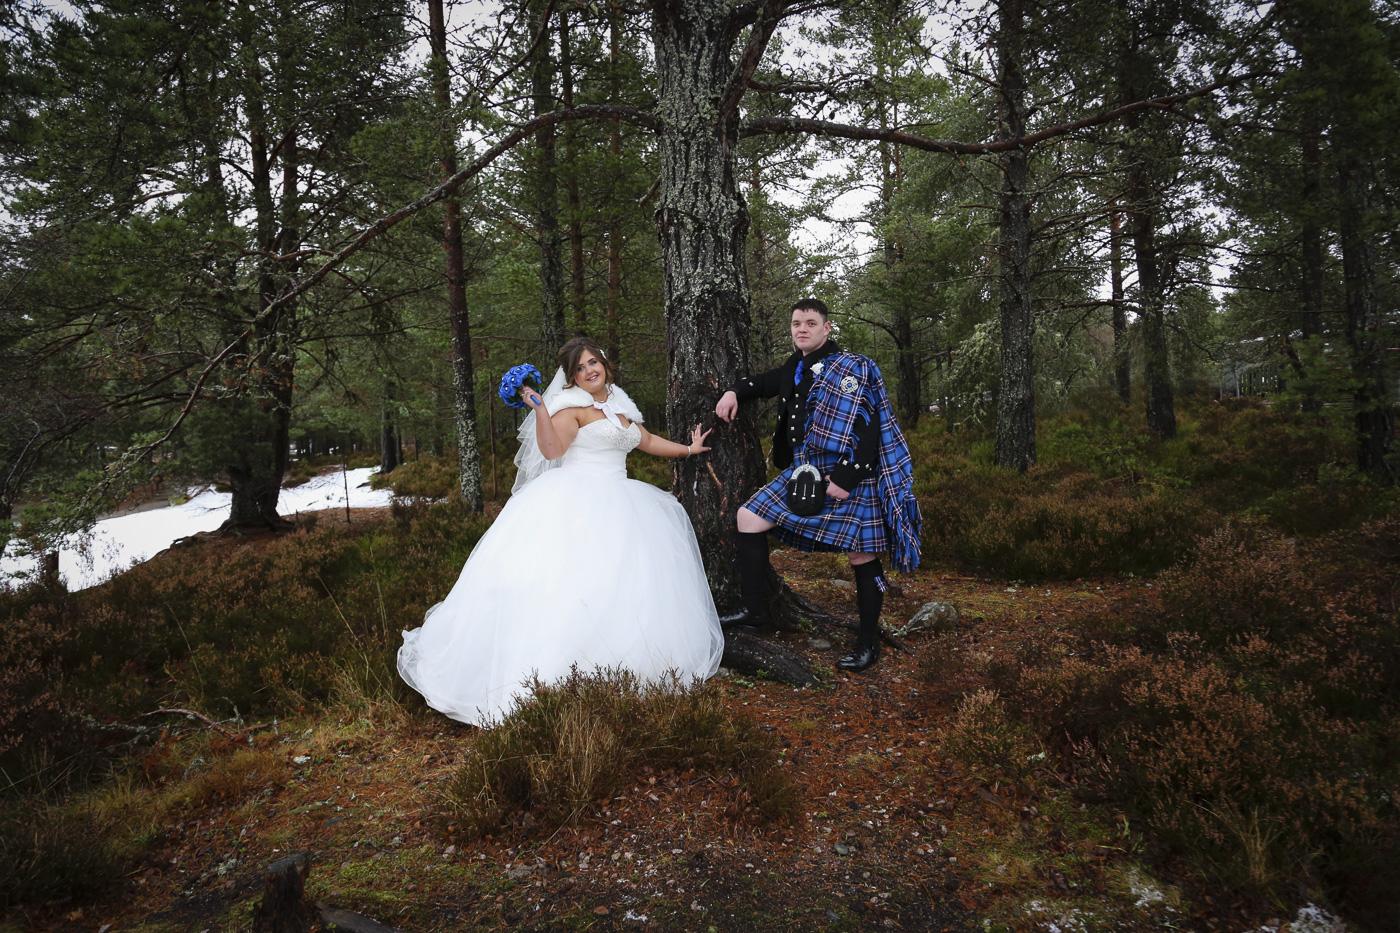 wedding-photography-at-the-hilton-coylumbridge-aviemore-2